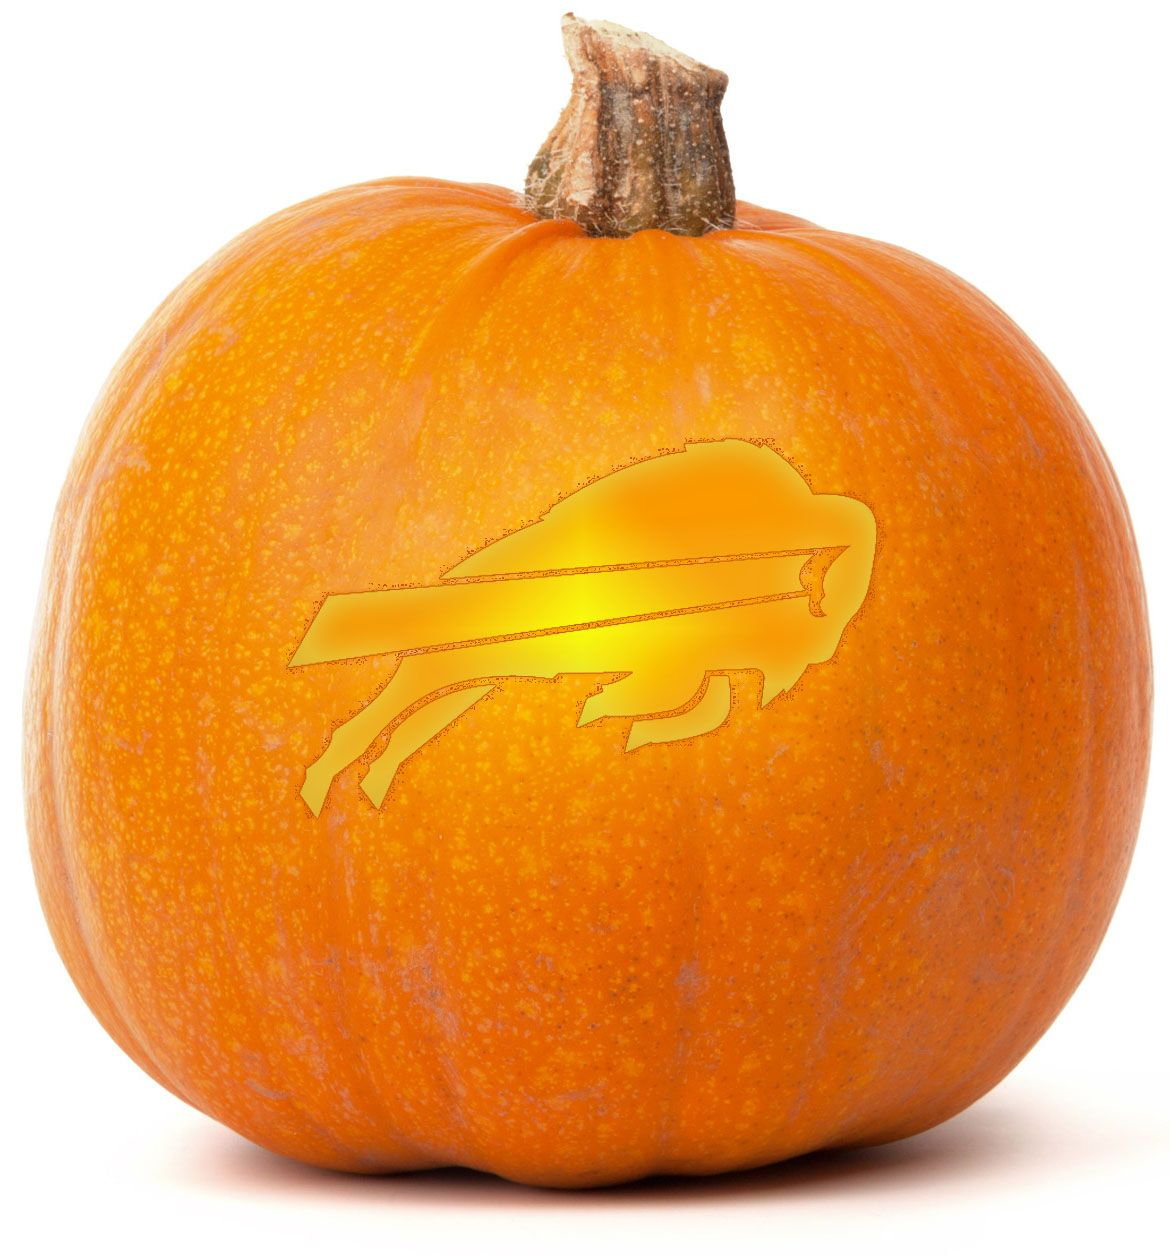 Buffalo Bills Pumpkin Carving Pumpkin carving templates